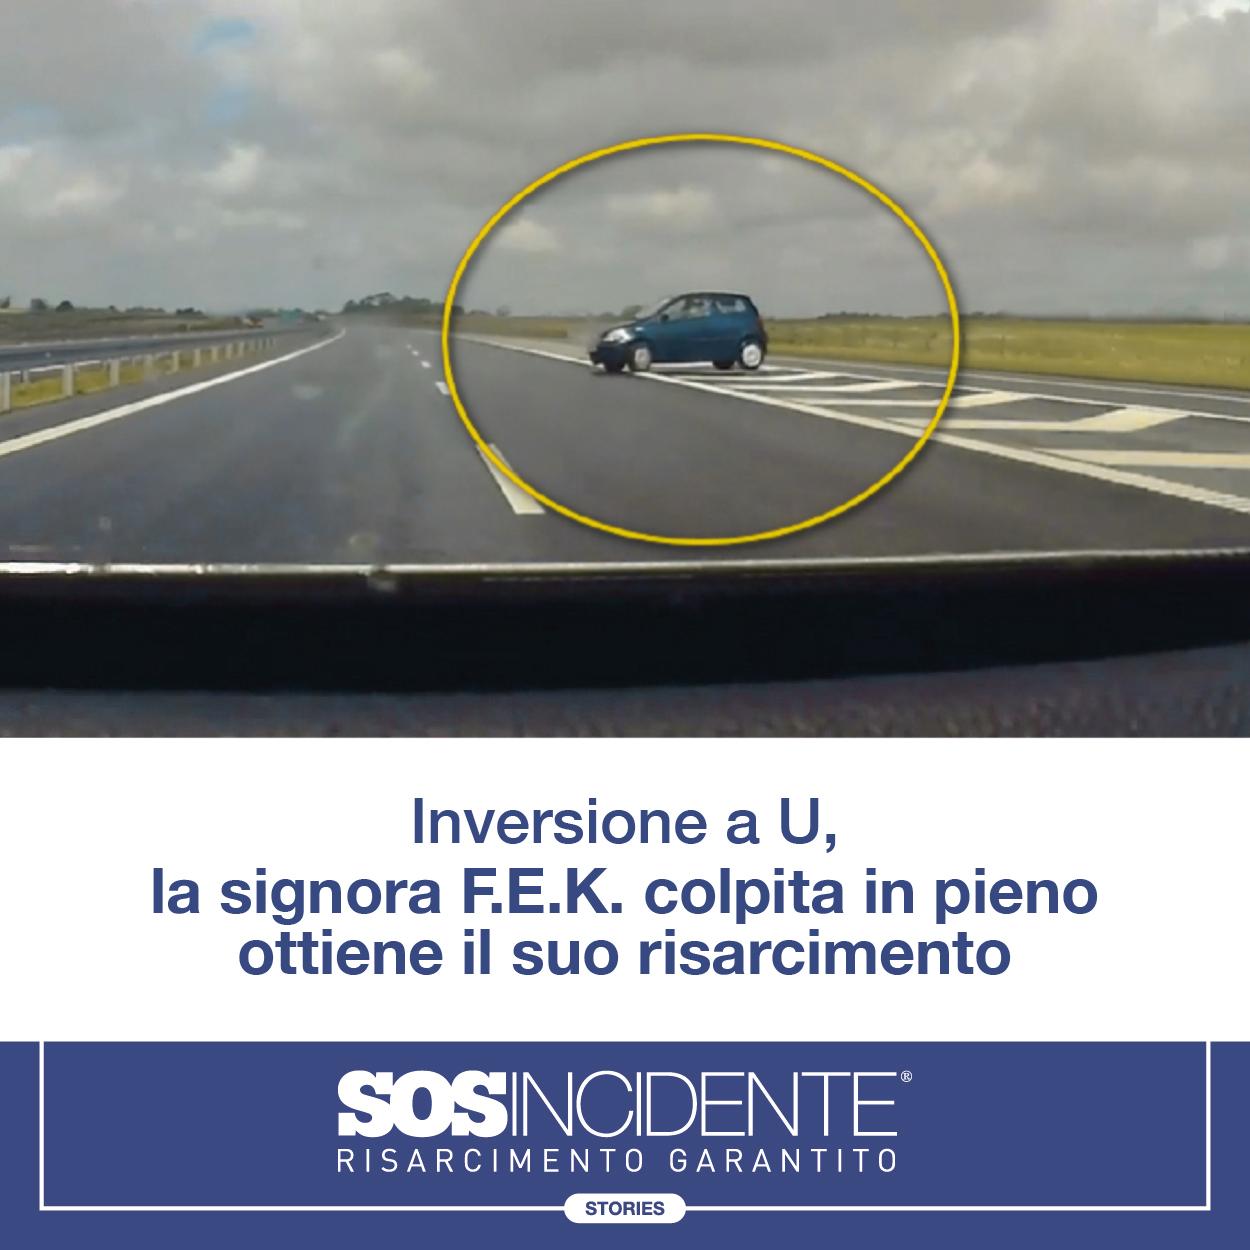 SOSIncidente_Inst_Storia_12_21